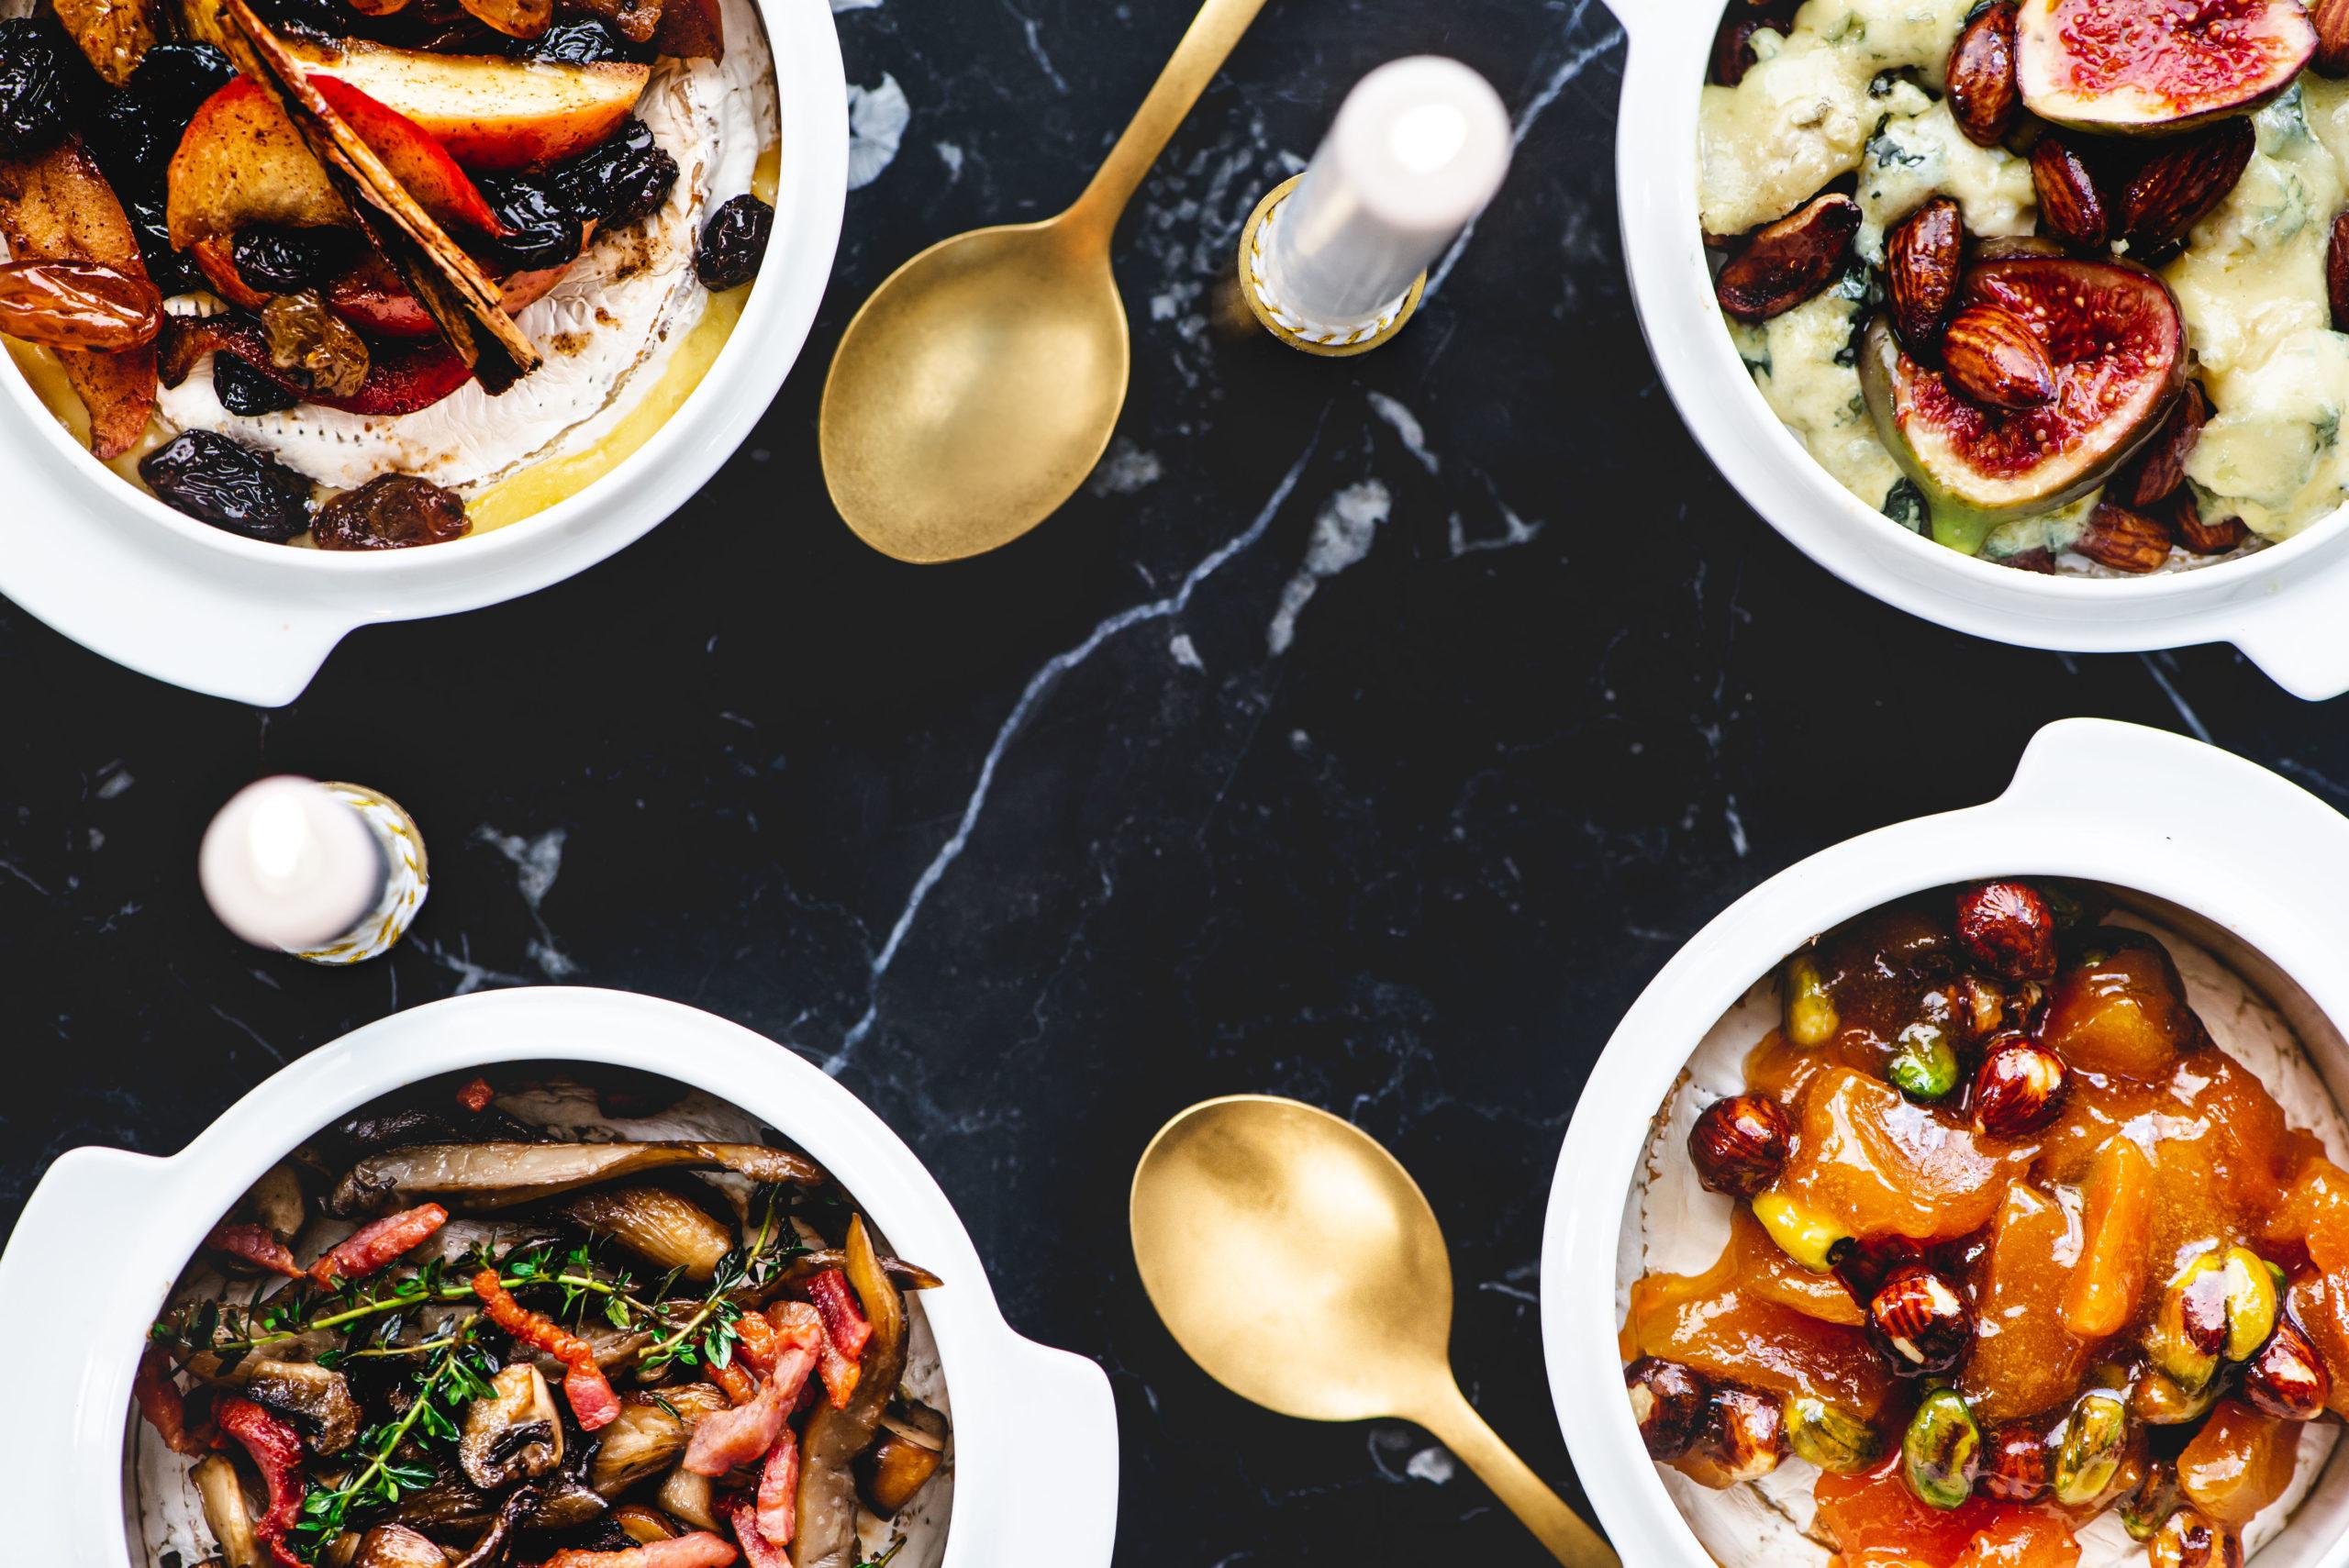 Zuivelhoeve december magazine Genieten - Stefanie Spoelder foodfotografie - food photography - foodfotograaf